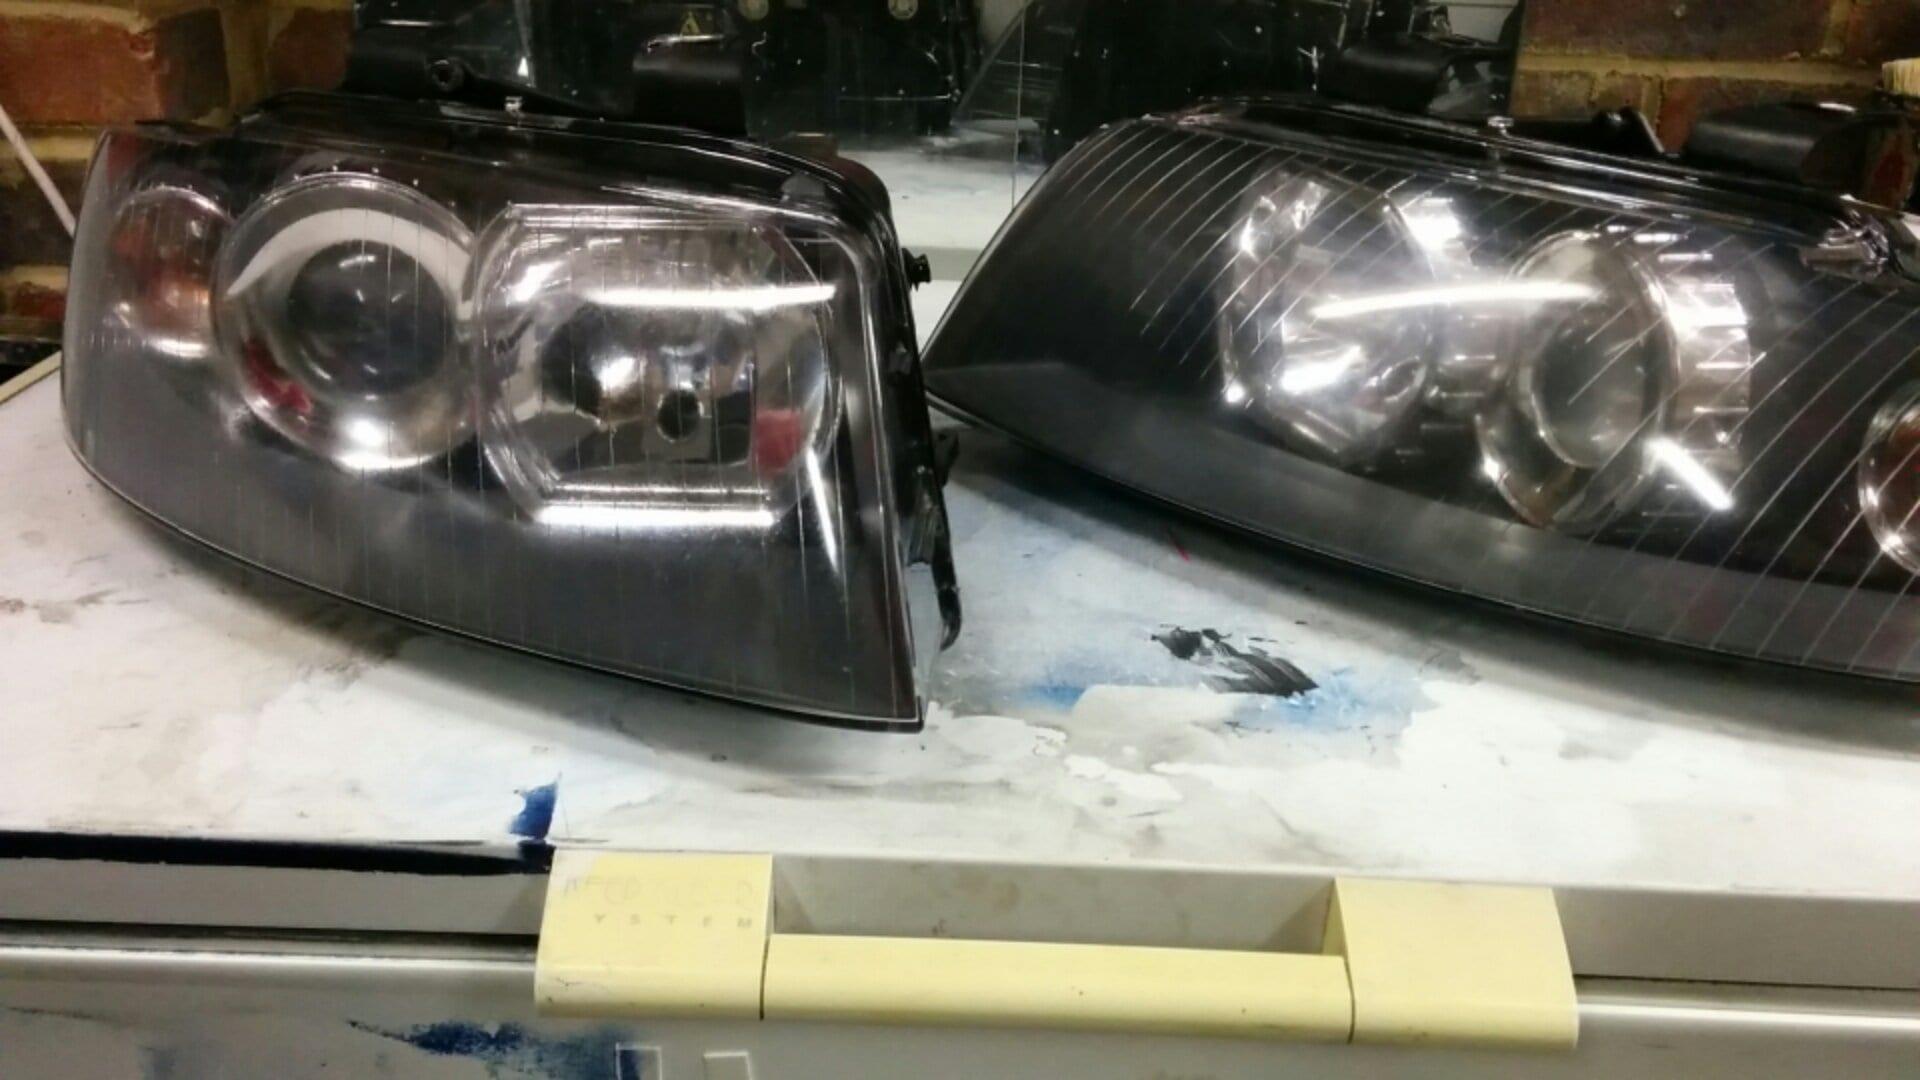 xenon dual monitor lights desktop for bmw hd lighting wallpapers wallpaper headlights ipad